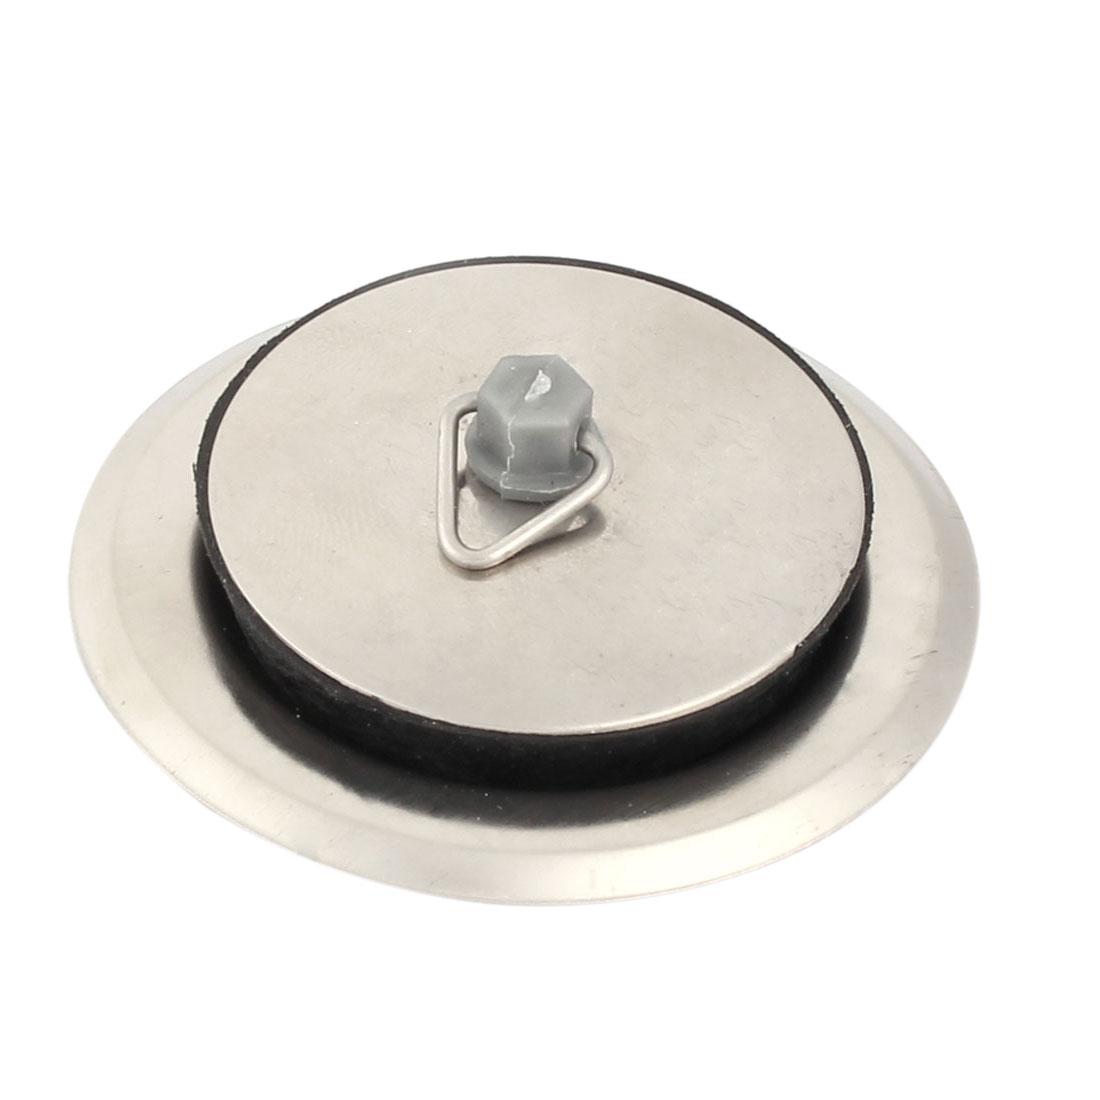 Kitchen Bathroom Stainless Steel Sink Strainer Disposal Basin Drain - image 3 of 3